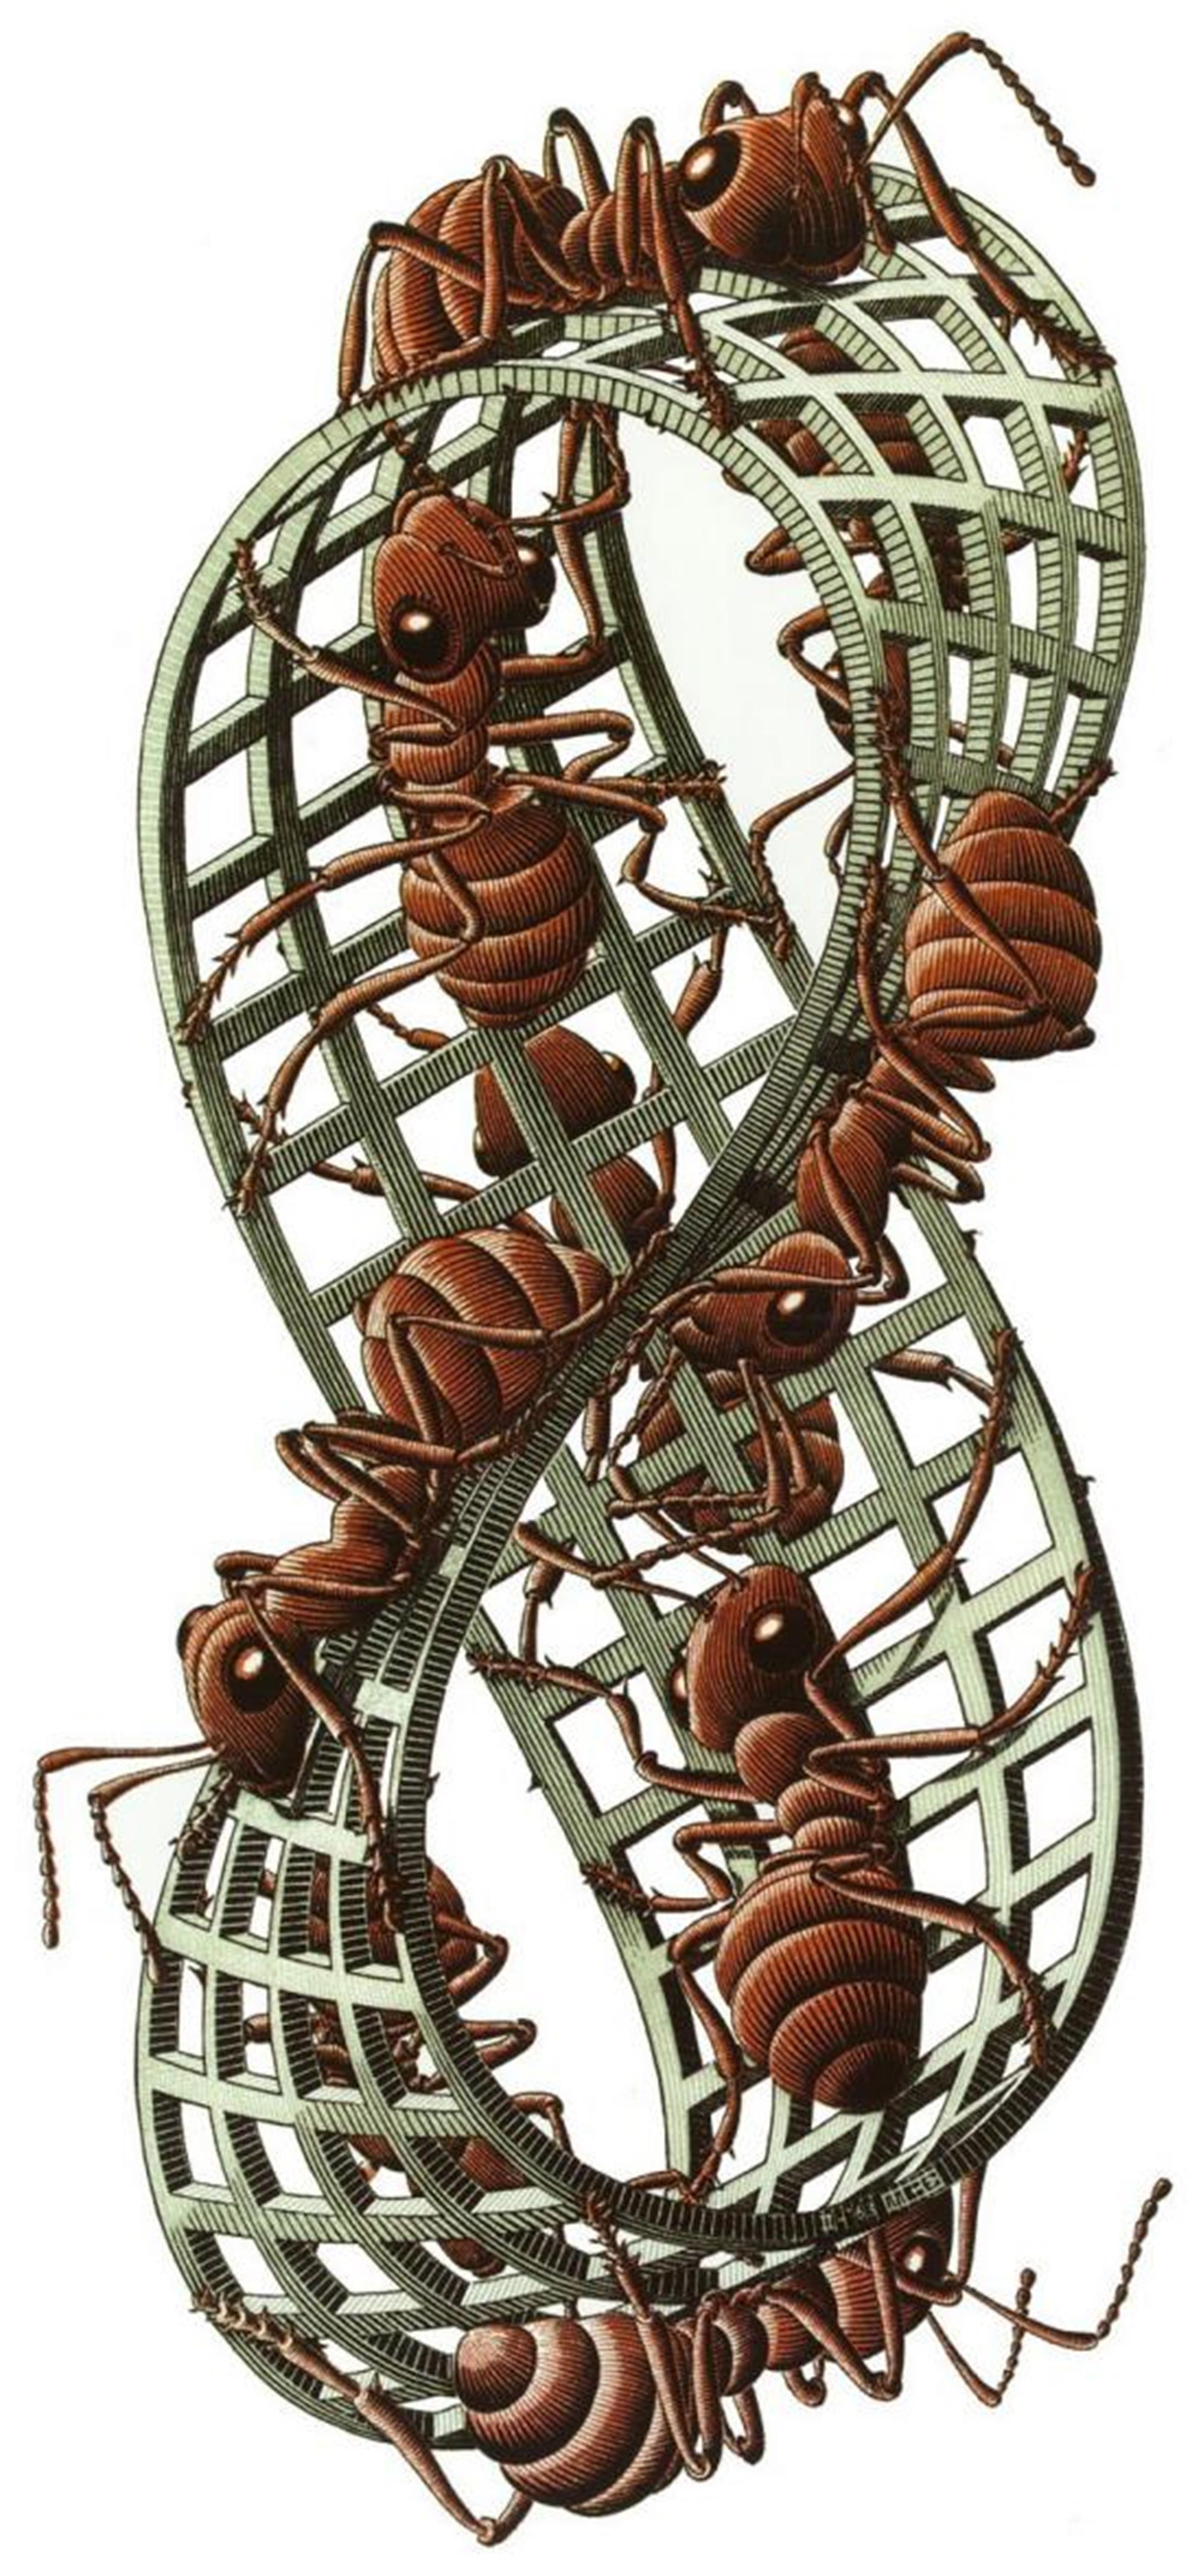 Mobius Strip II (Red Ants) by M.C. Escher